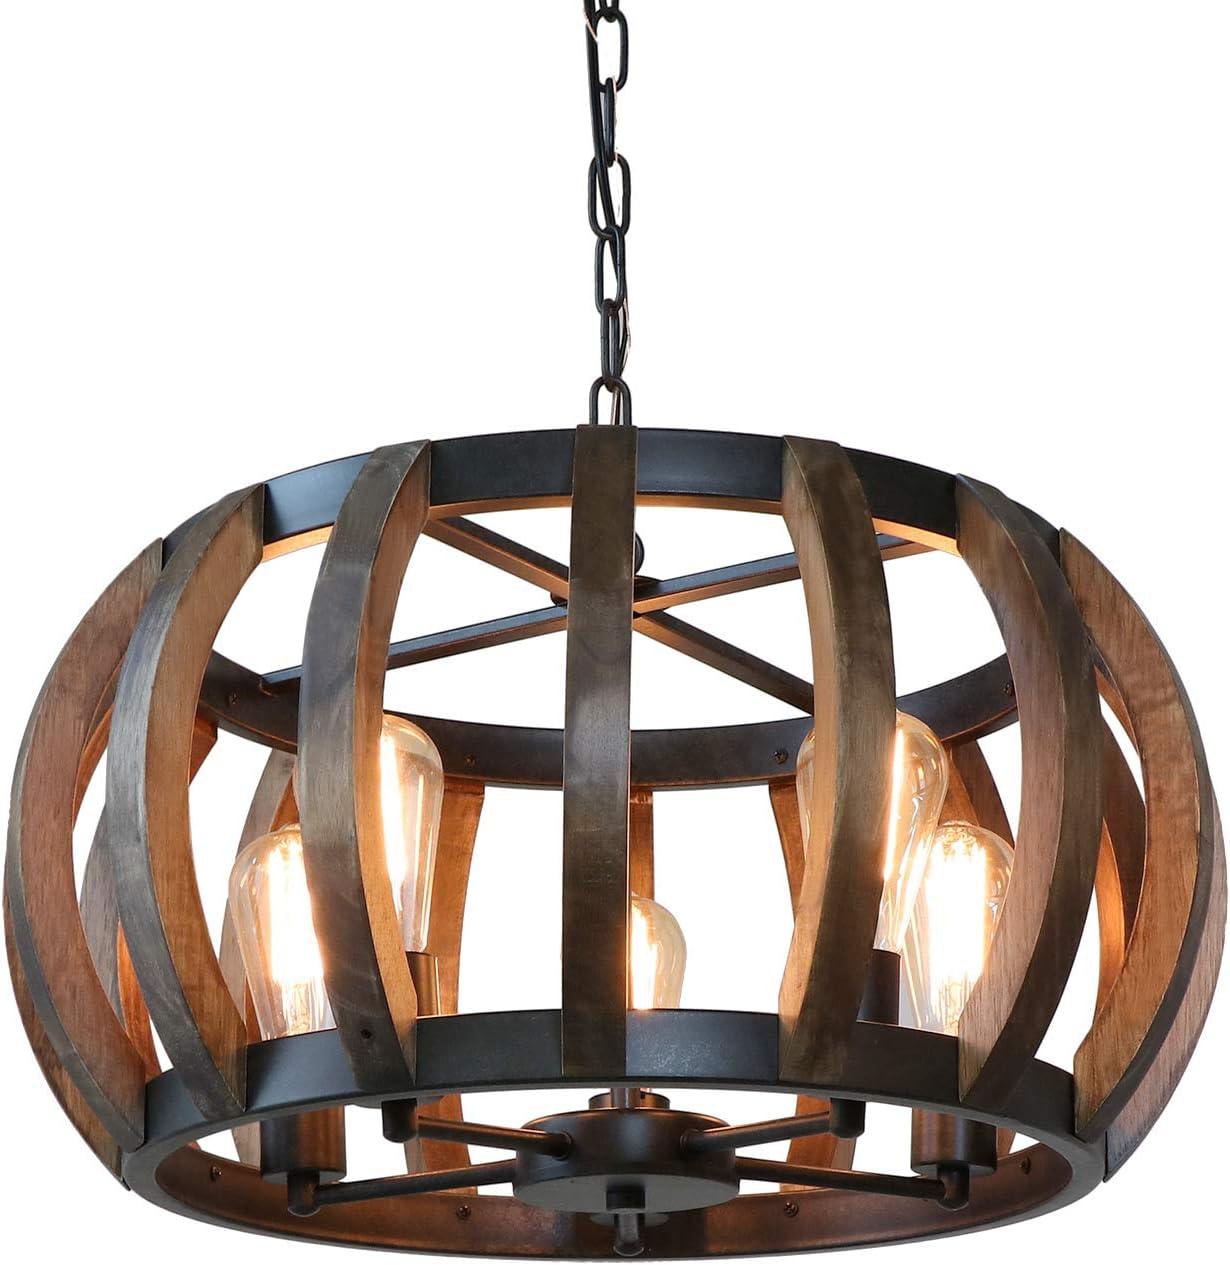 Anmytek Pumpkin Round Pendant Light Vintage Rustic Wood Frame Lamp Adjustable Chain Chandelier E26 Base Bulb Hanging Lighting Kitchen Island Dining Room Ceiling Light Fixture 5-Light C0070